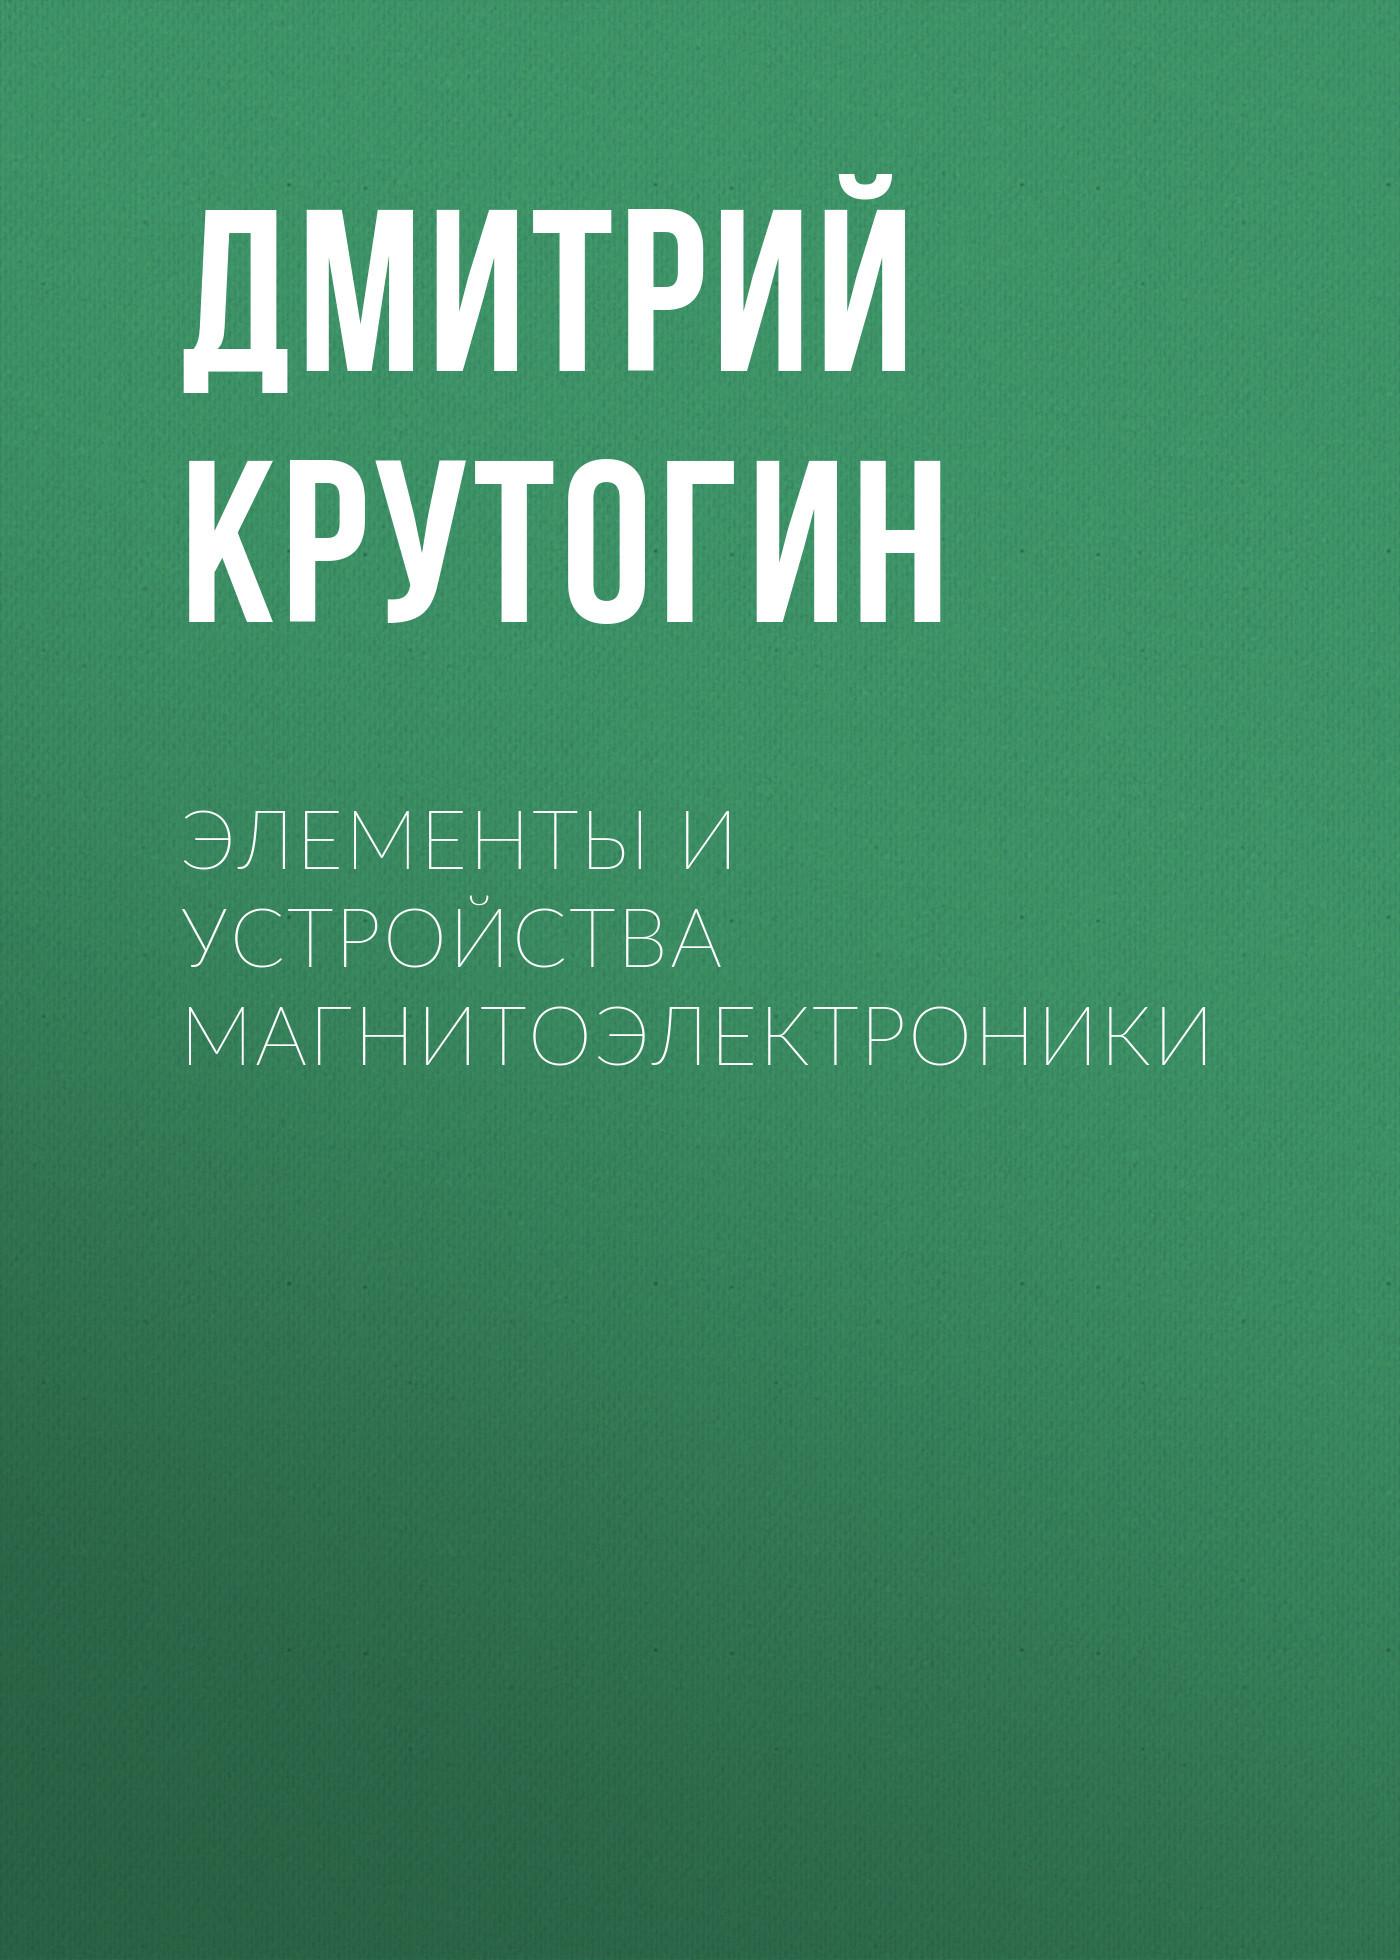 Дмитрий Крутогин бесплатно